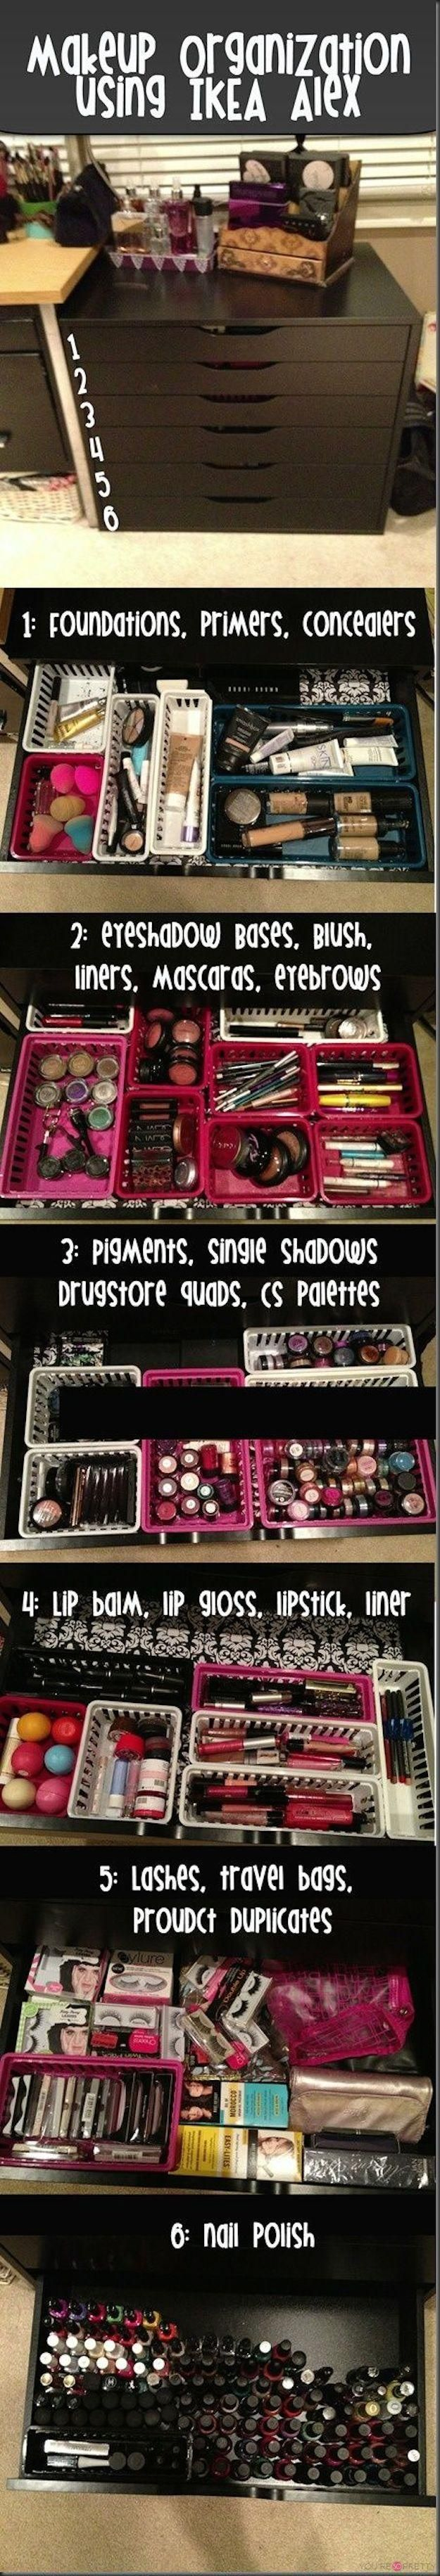 Makeup Storage Ideas | Best makeup brush sets, makeup brush holder, ... #youresopretty More